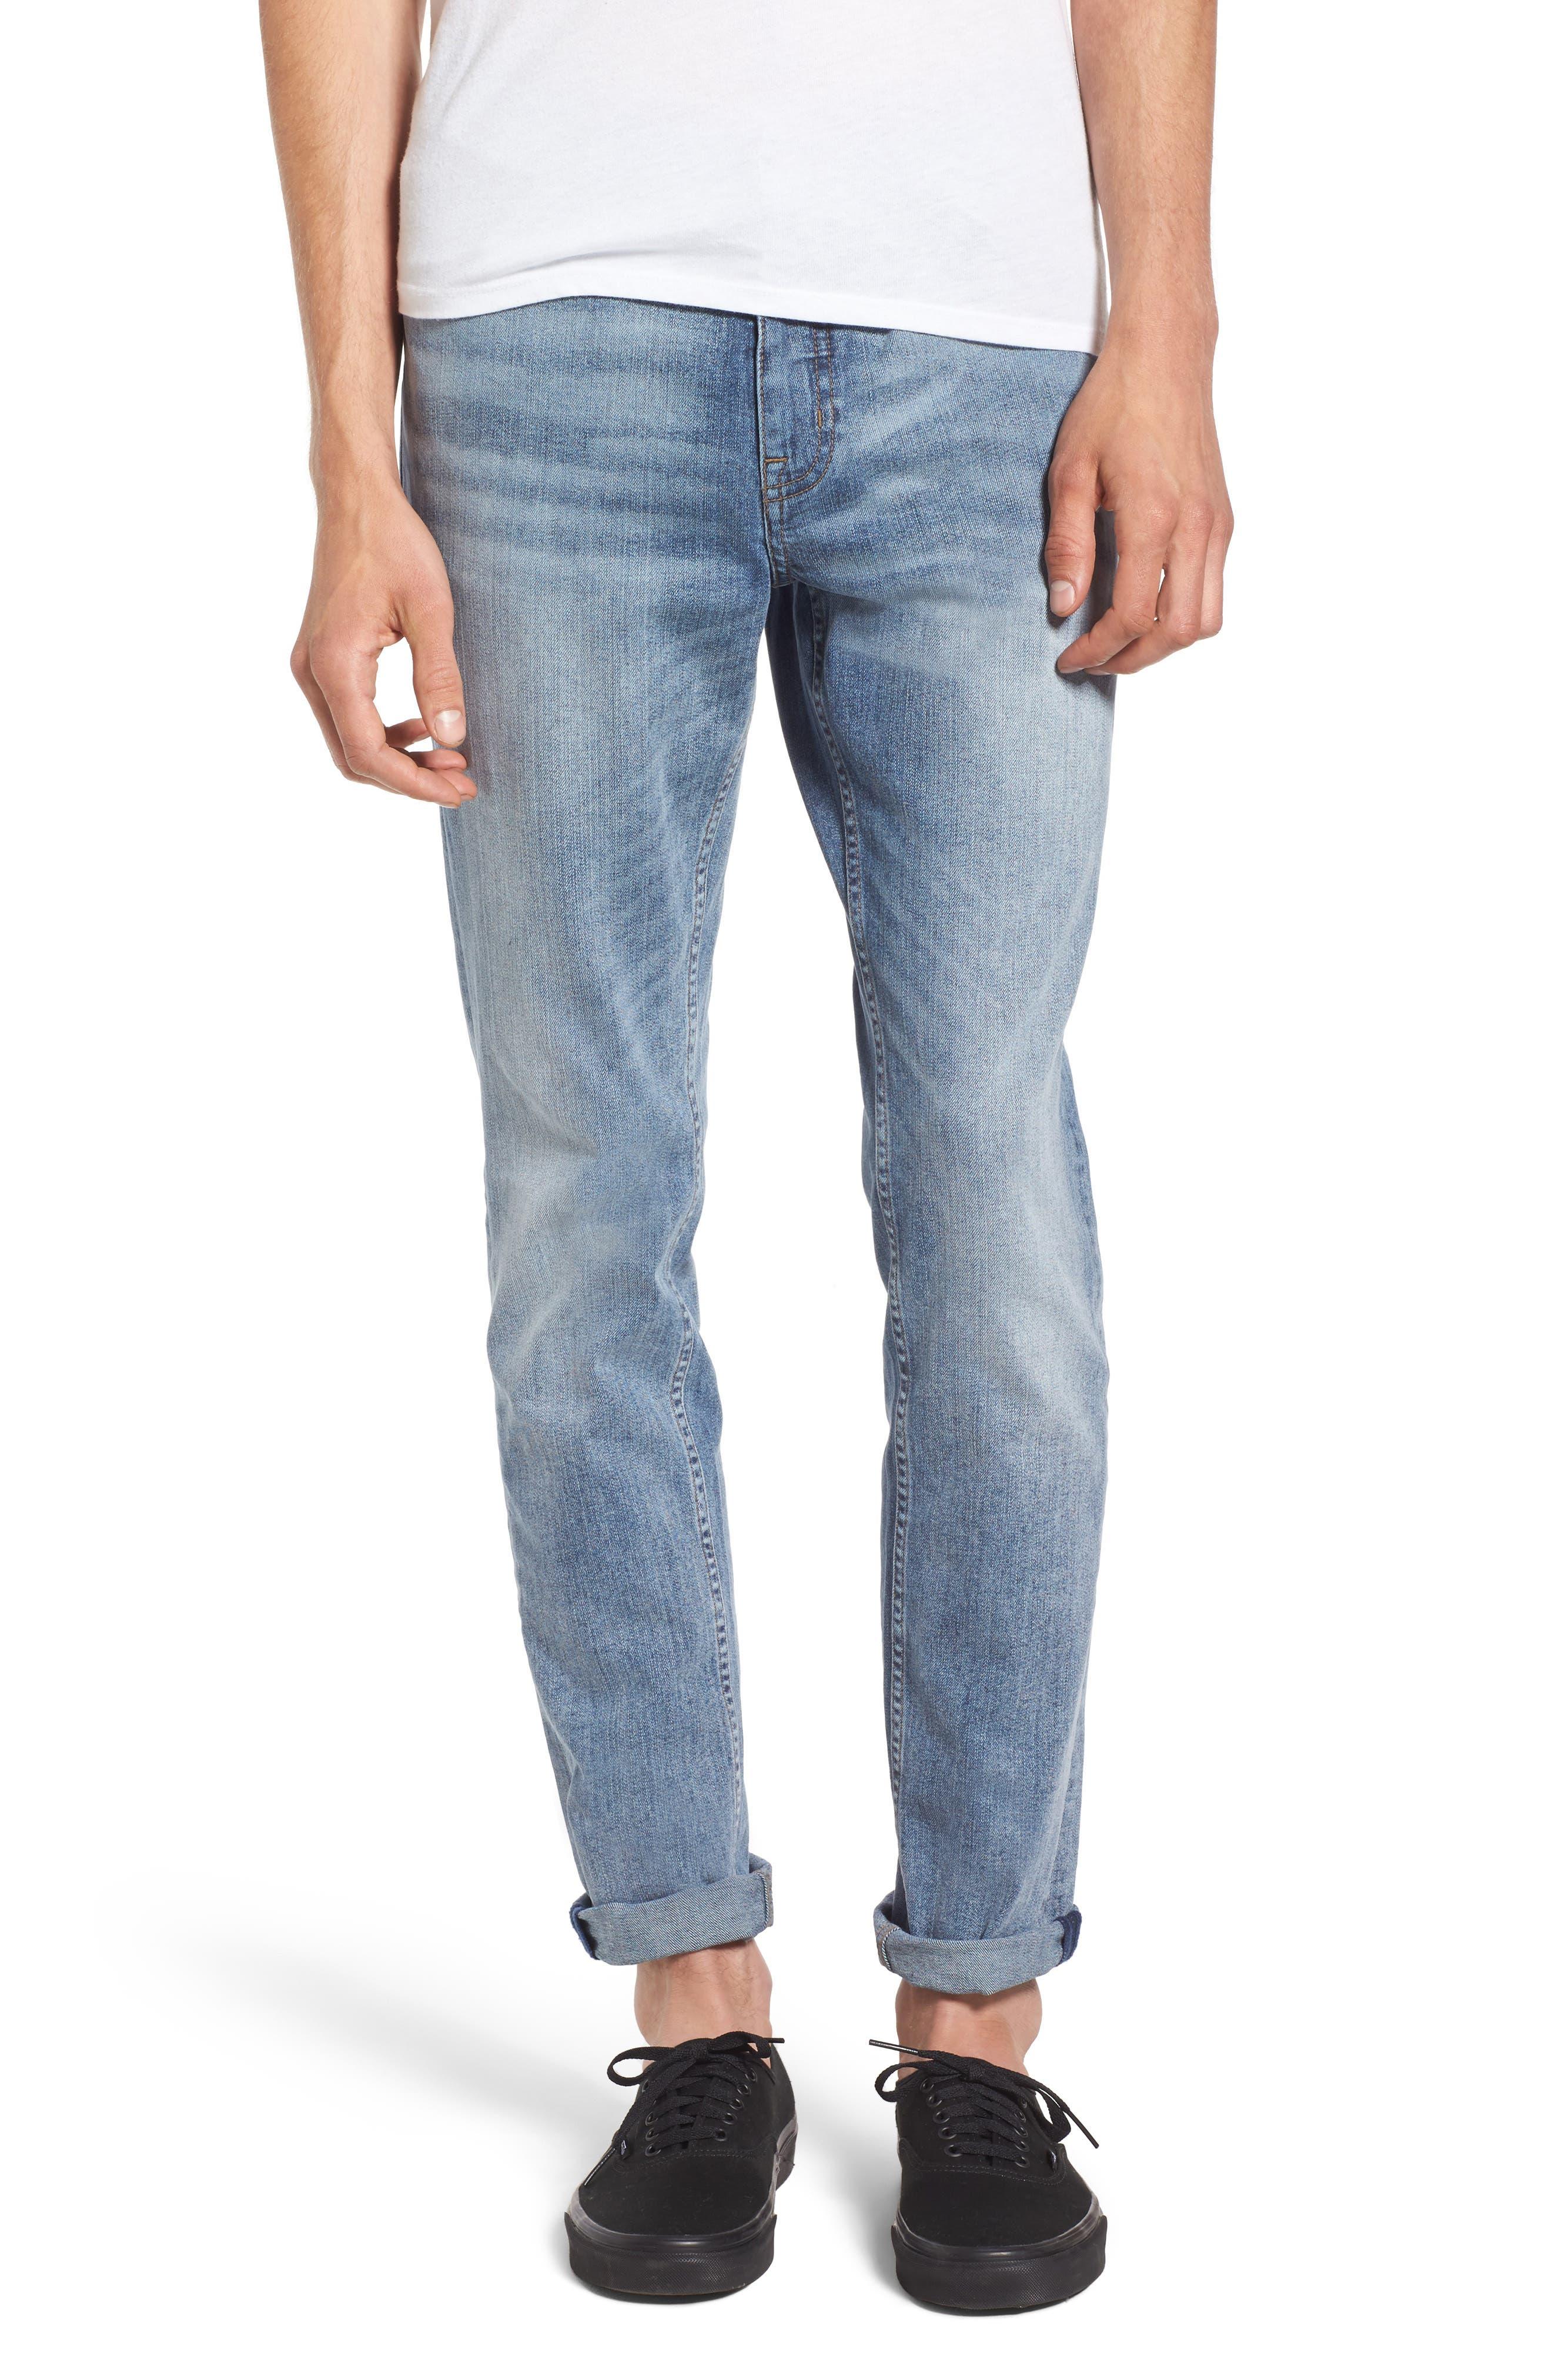 Sonic Skinny Fit Jeans,                         Main,                         color, Treble Blue